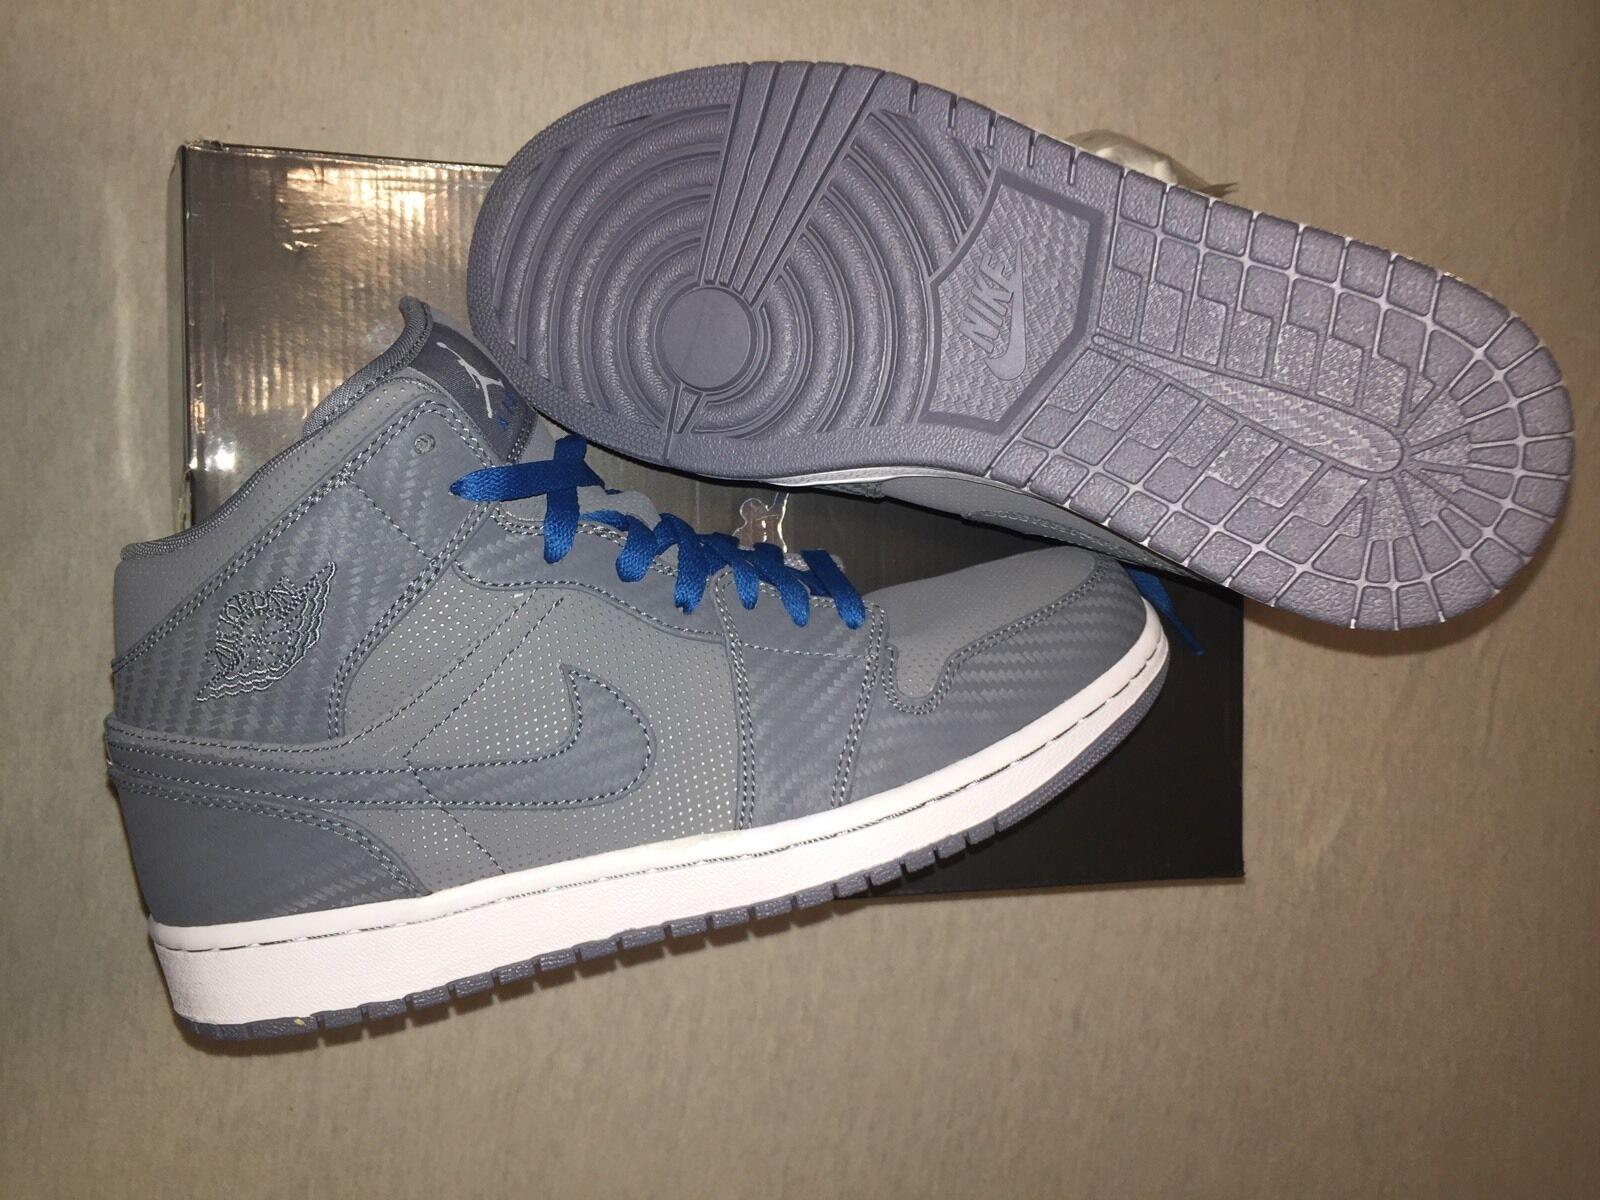 Nike air jordan 1 phat scadente e la moda